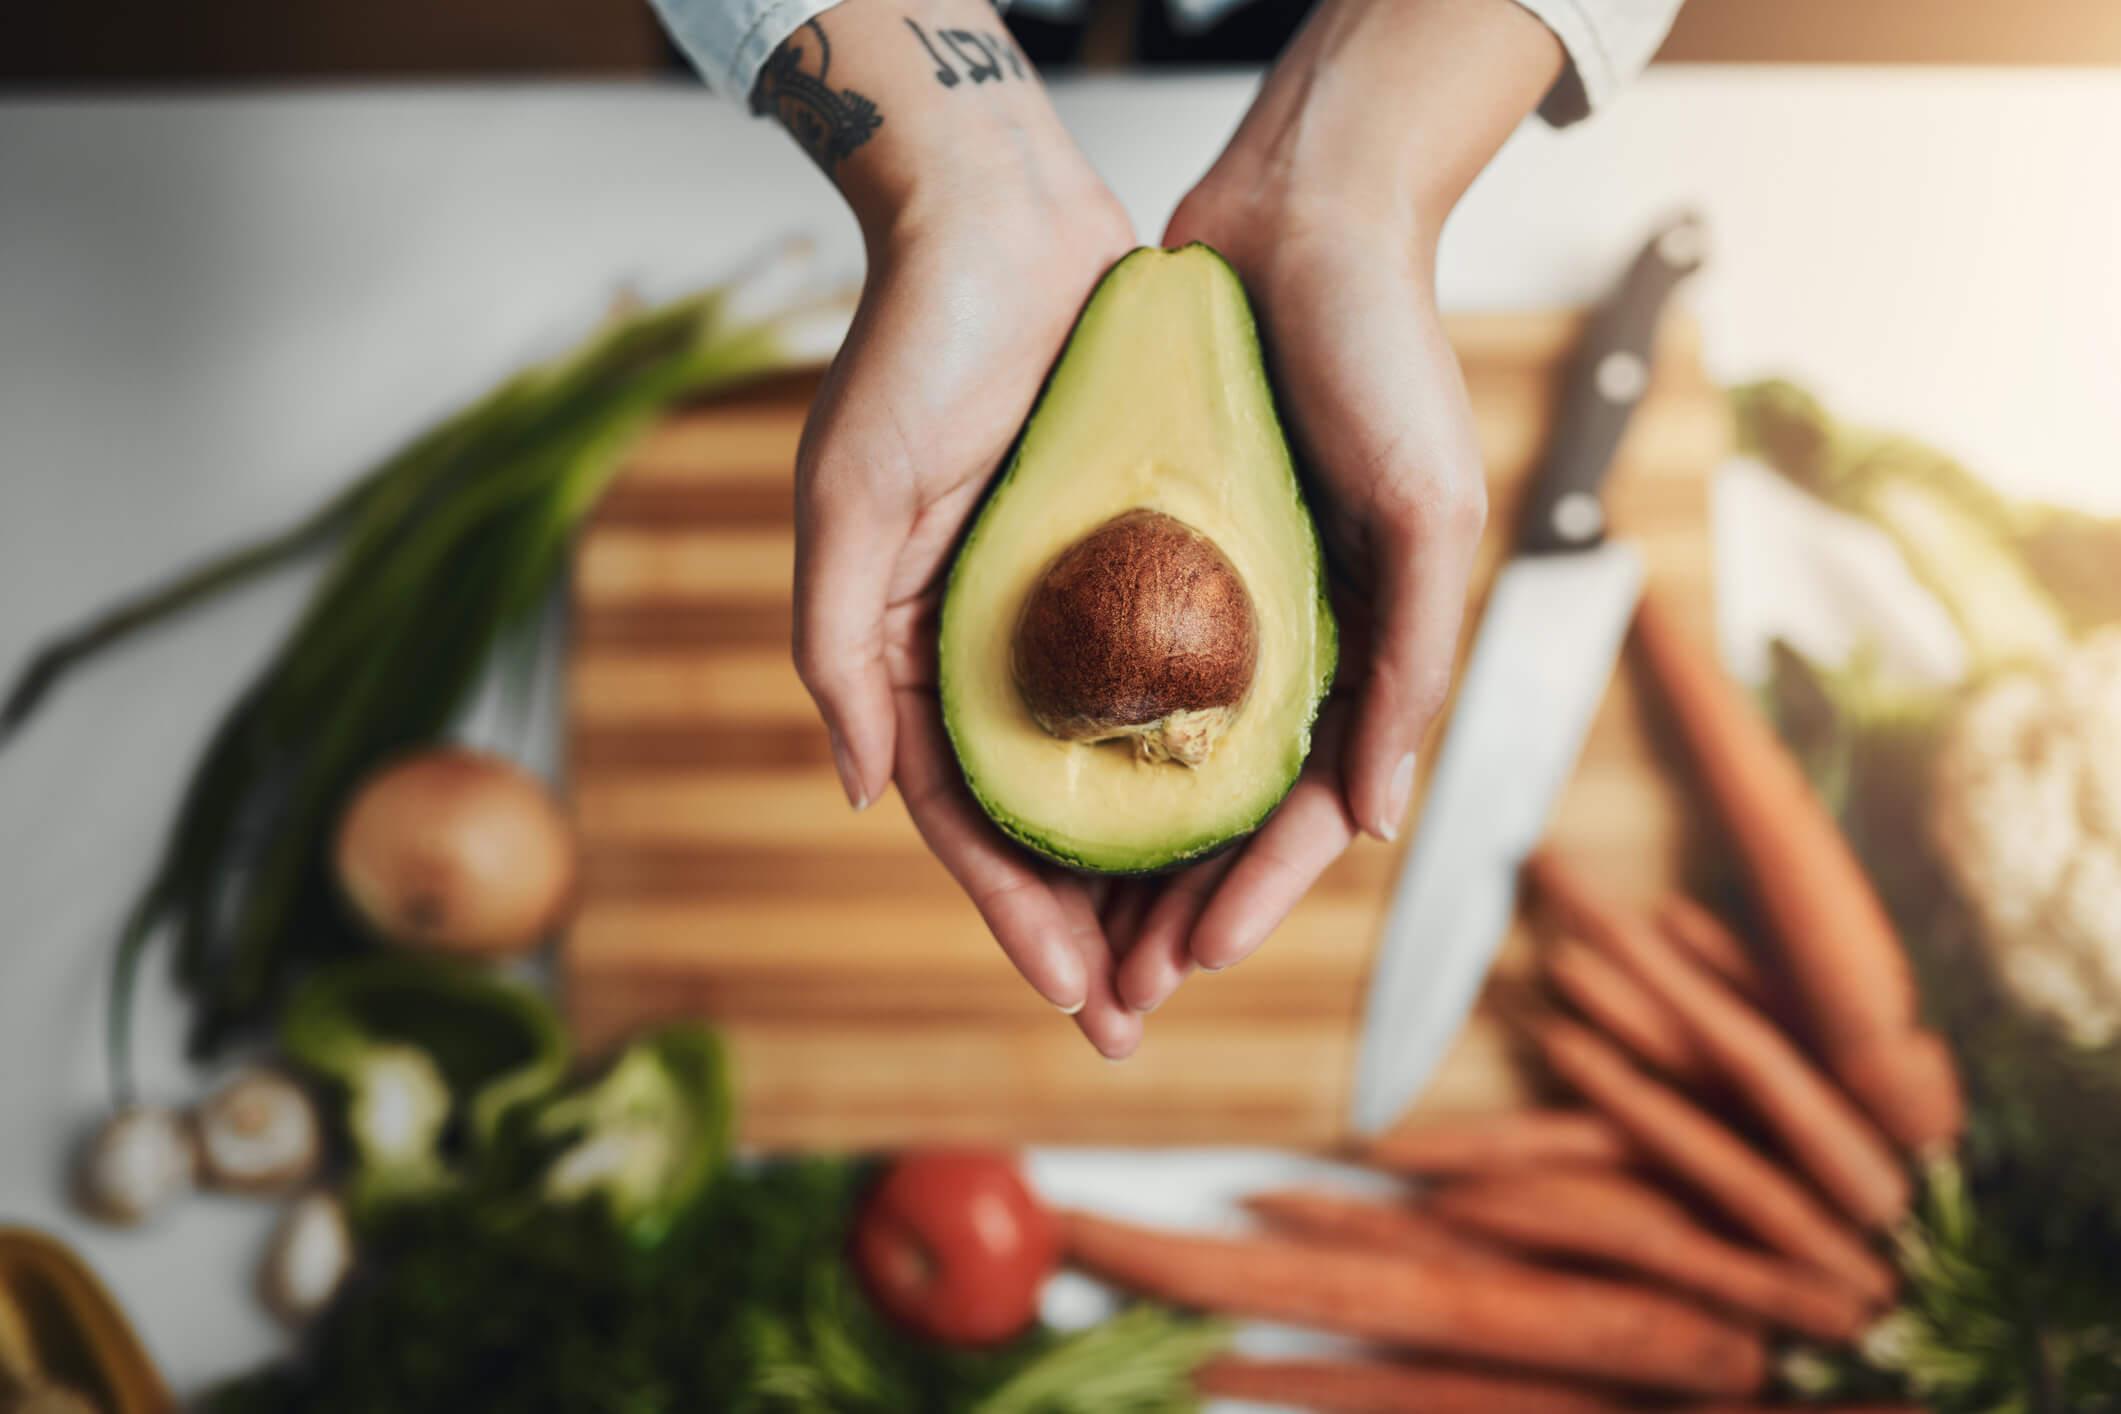 woman preparing an avocado